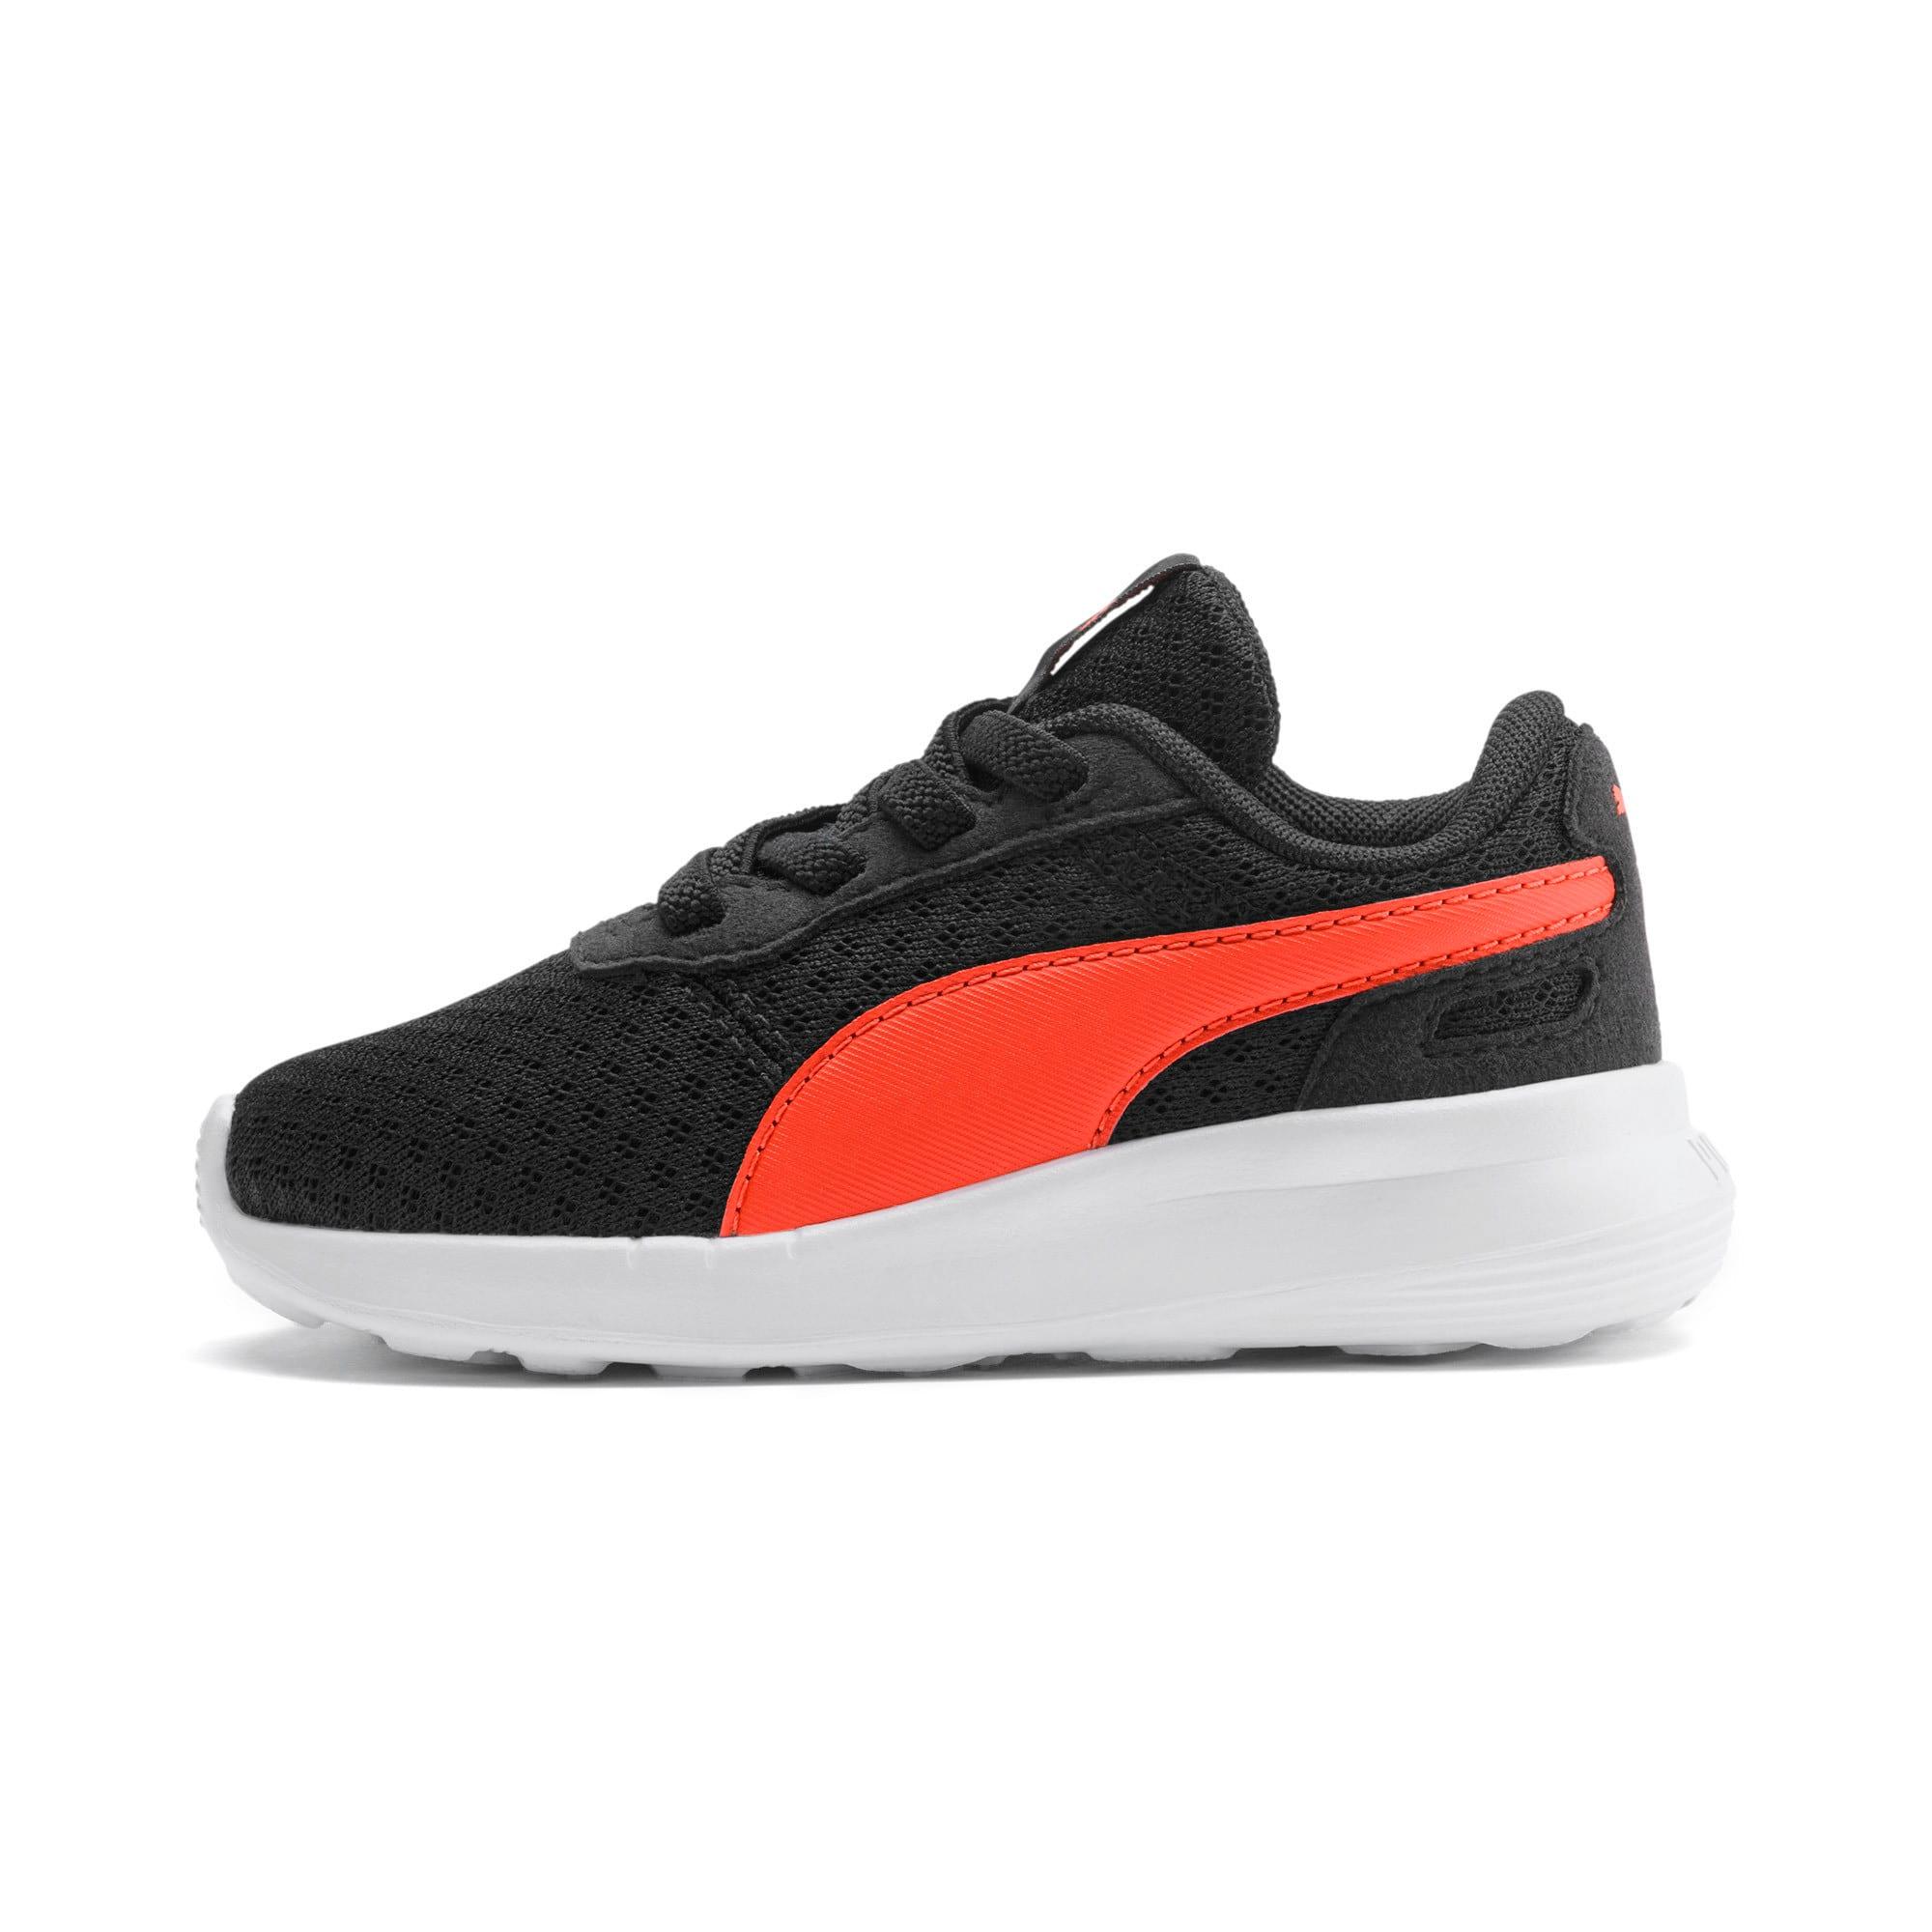 Thumbnail 1 of ST Activate AC Toddler Shoes, Puma Black-Cherry Tomato, medium